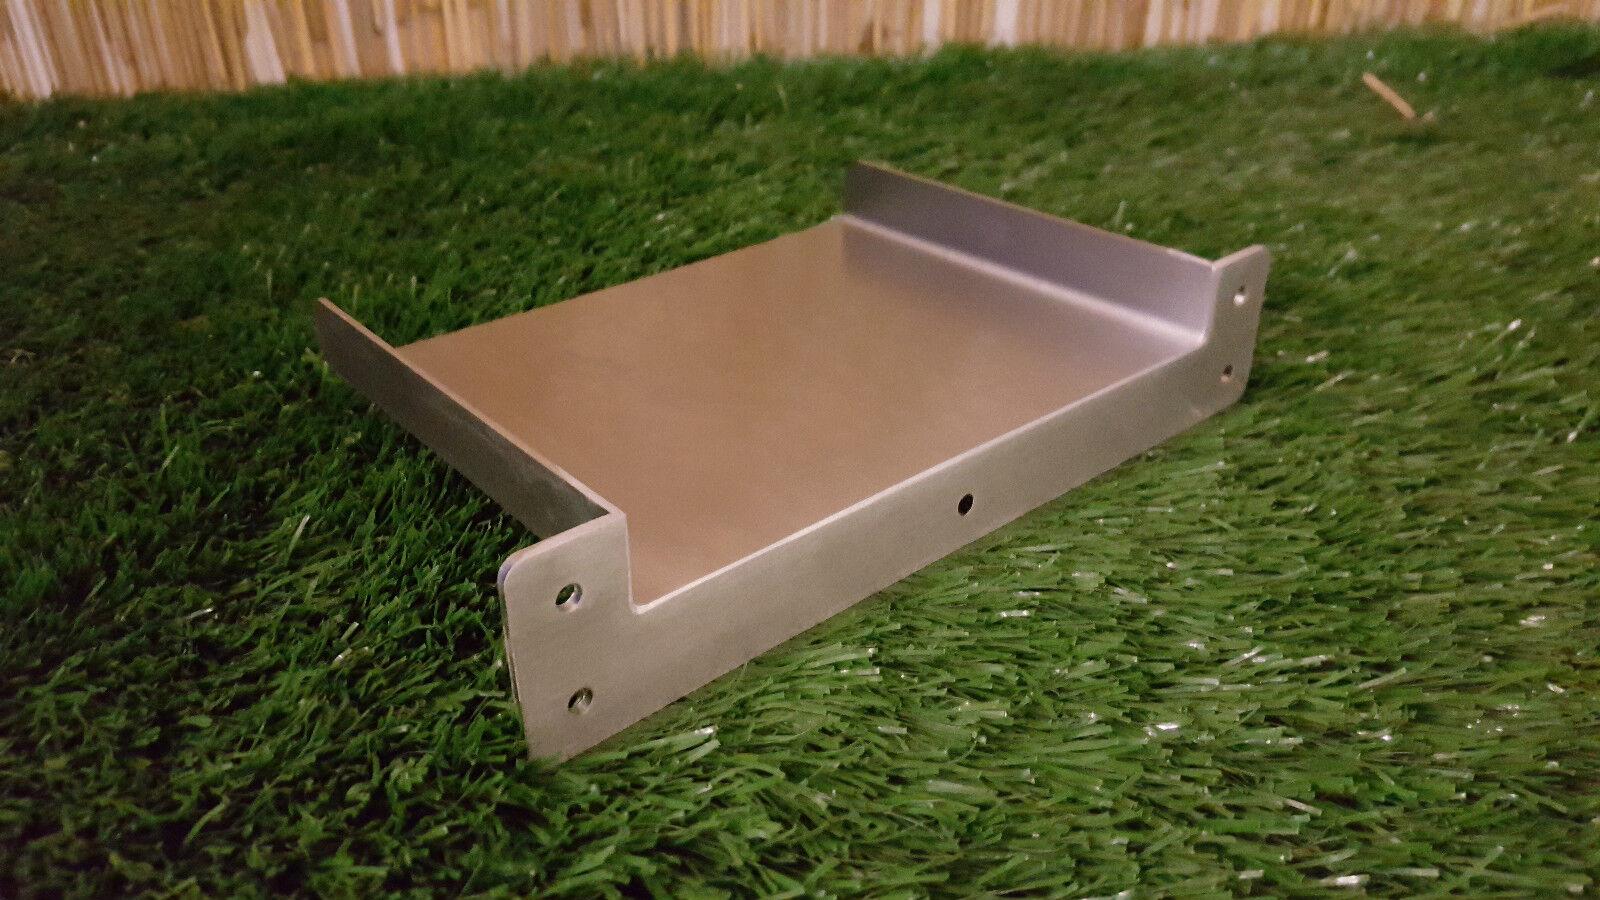 200mm stainless steel waterfall spillway veggie filter for Pond veggie filter